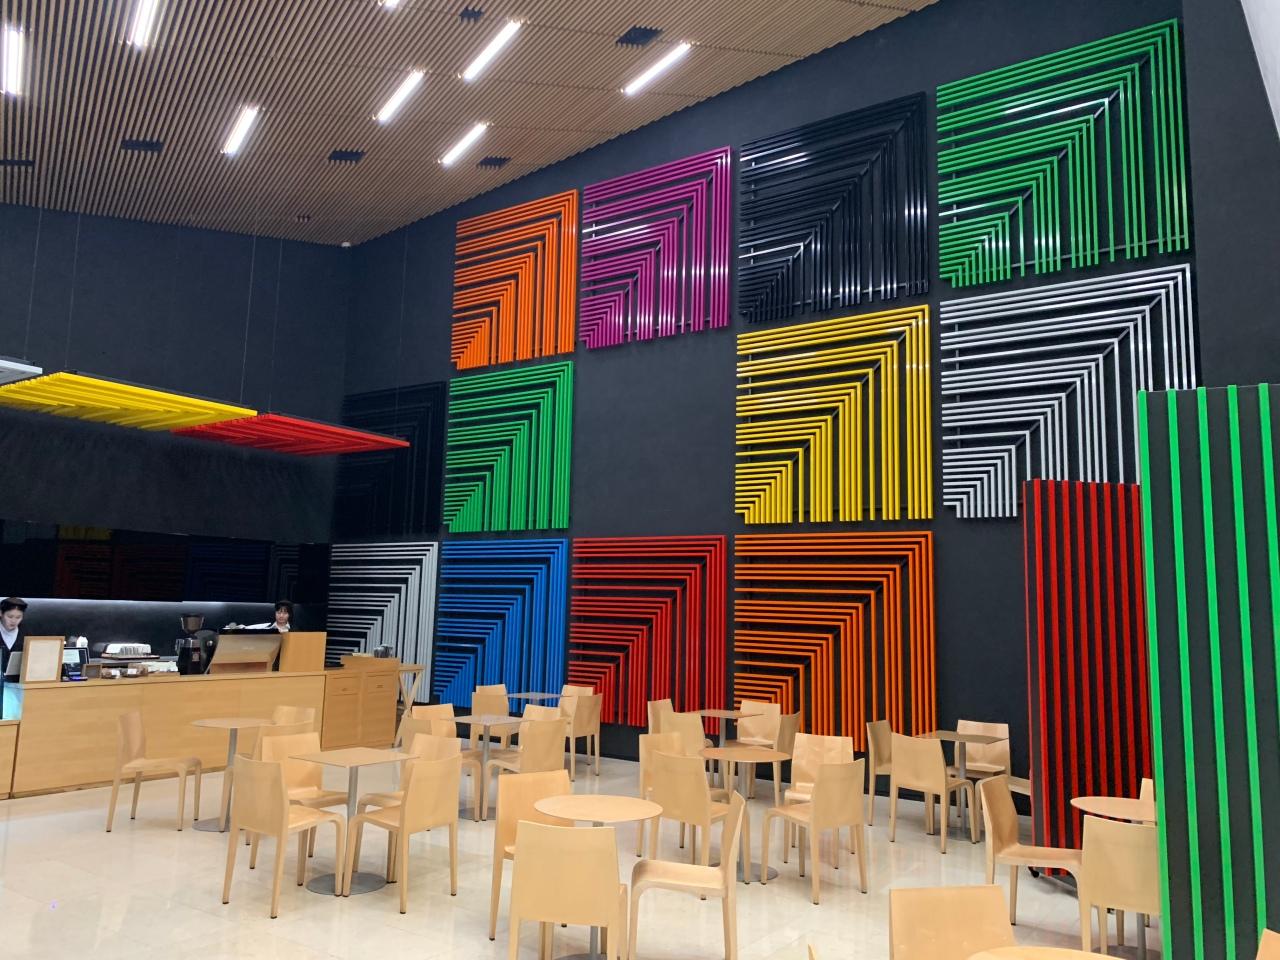 Art Museum inKorea